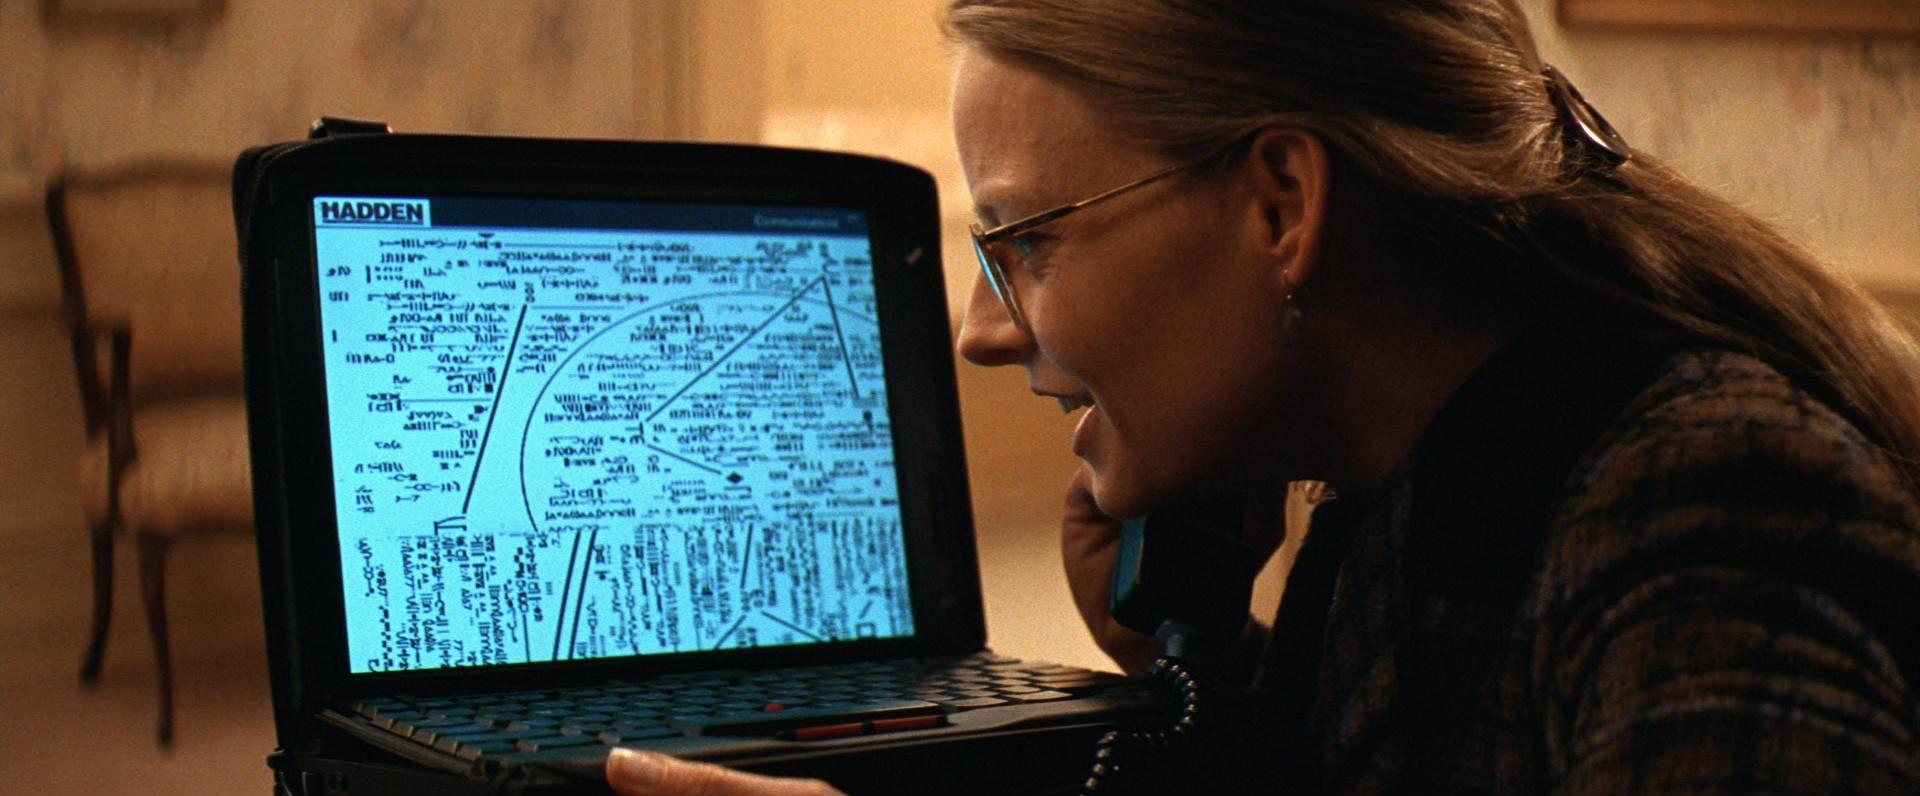 Кадр из фильма Контакт (1997 г.)